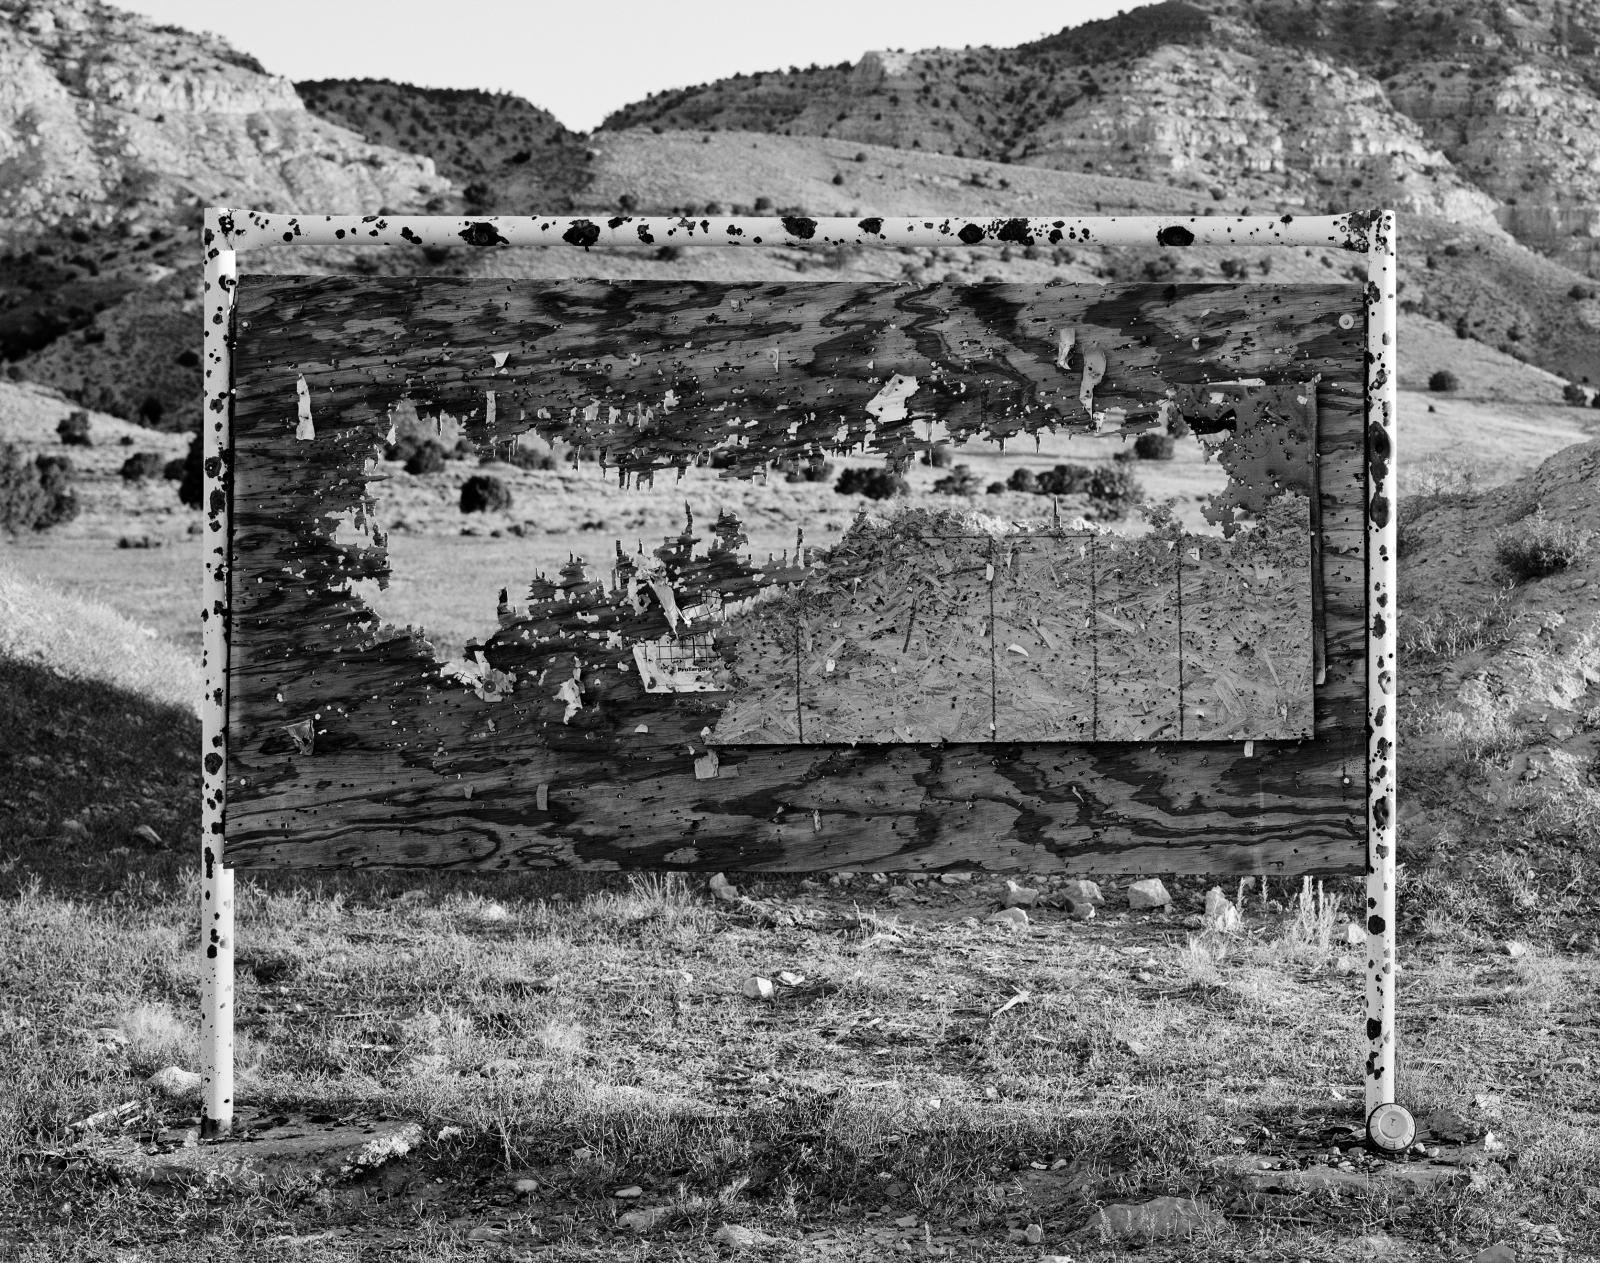 Jeff Whetstone, Joseph Redux, 2010, Gelatin silver print, 38 x 48 inches. Image courtesy the artist.